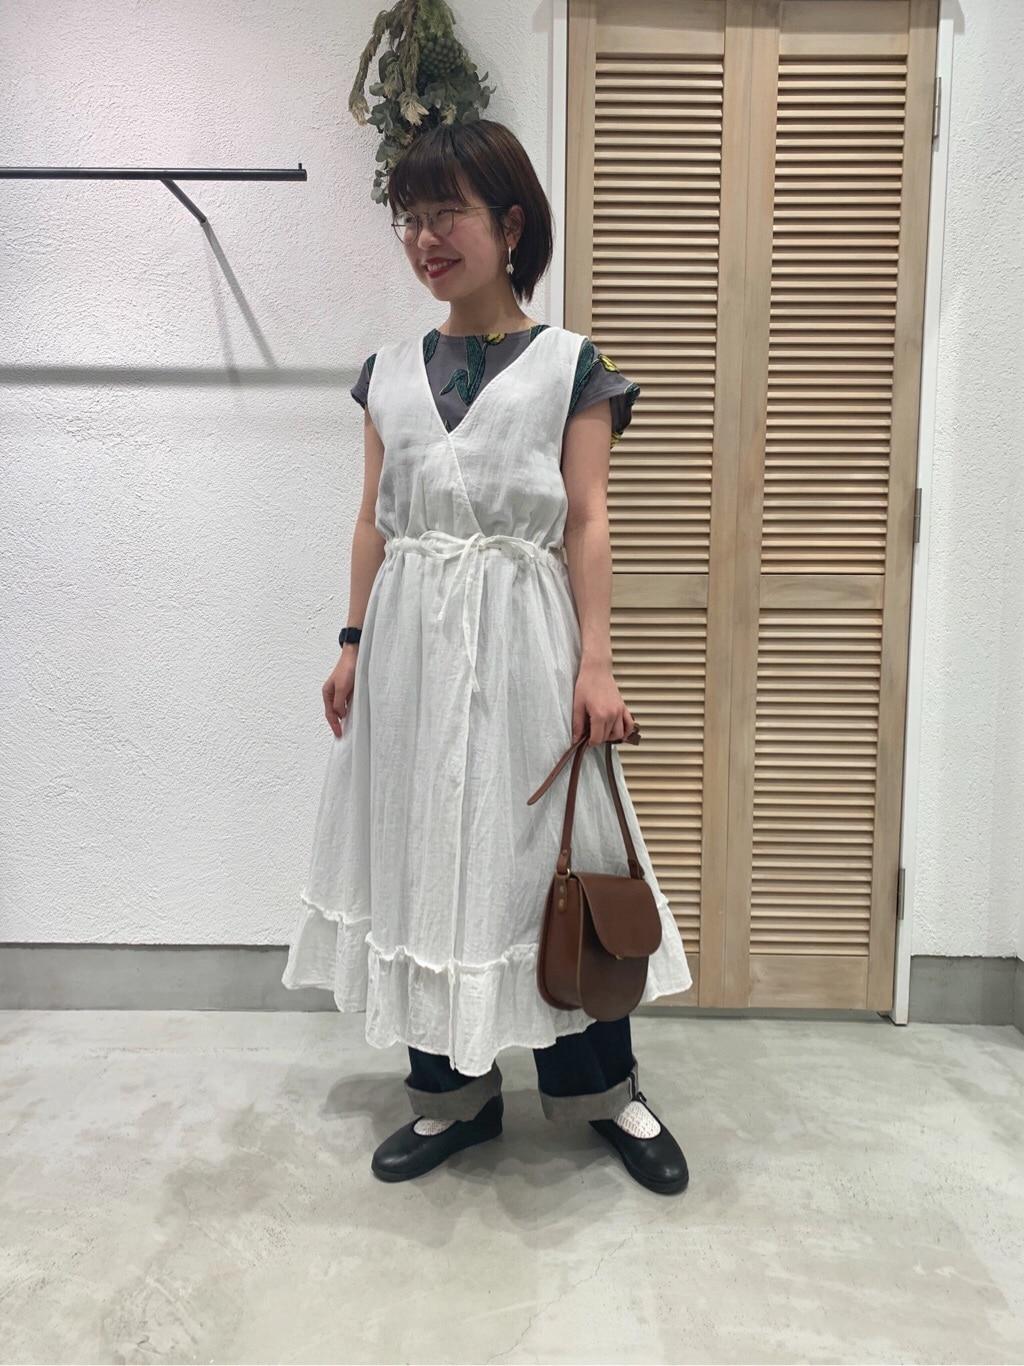 chambre de charme 横浜ジョイナス 身長:153cm 2020.04.17